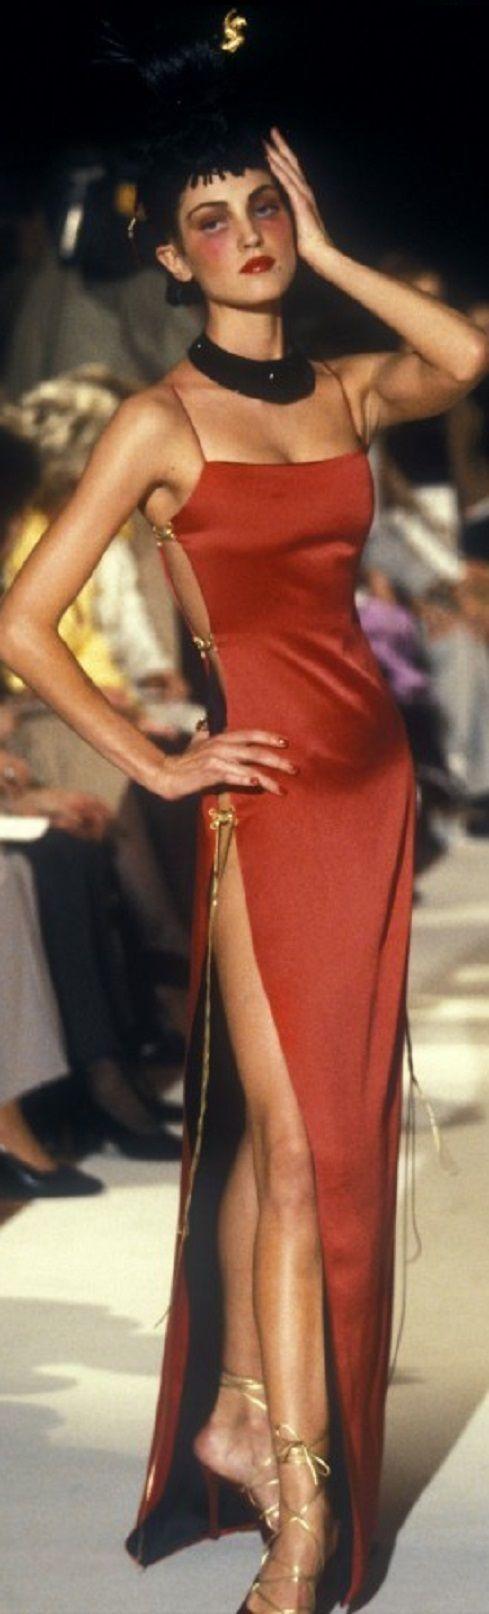 Inka lace dress yellow   best GODDESS LEWKS images on Pinterest  Roaring s Showgirls